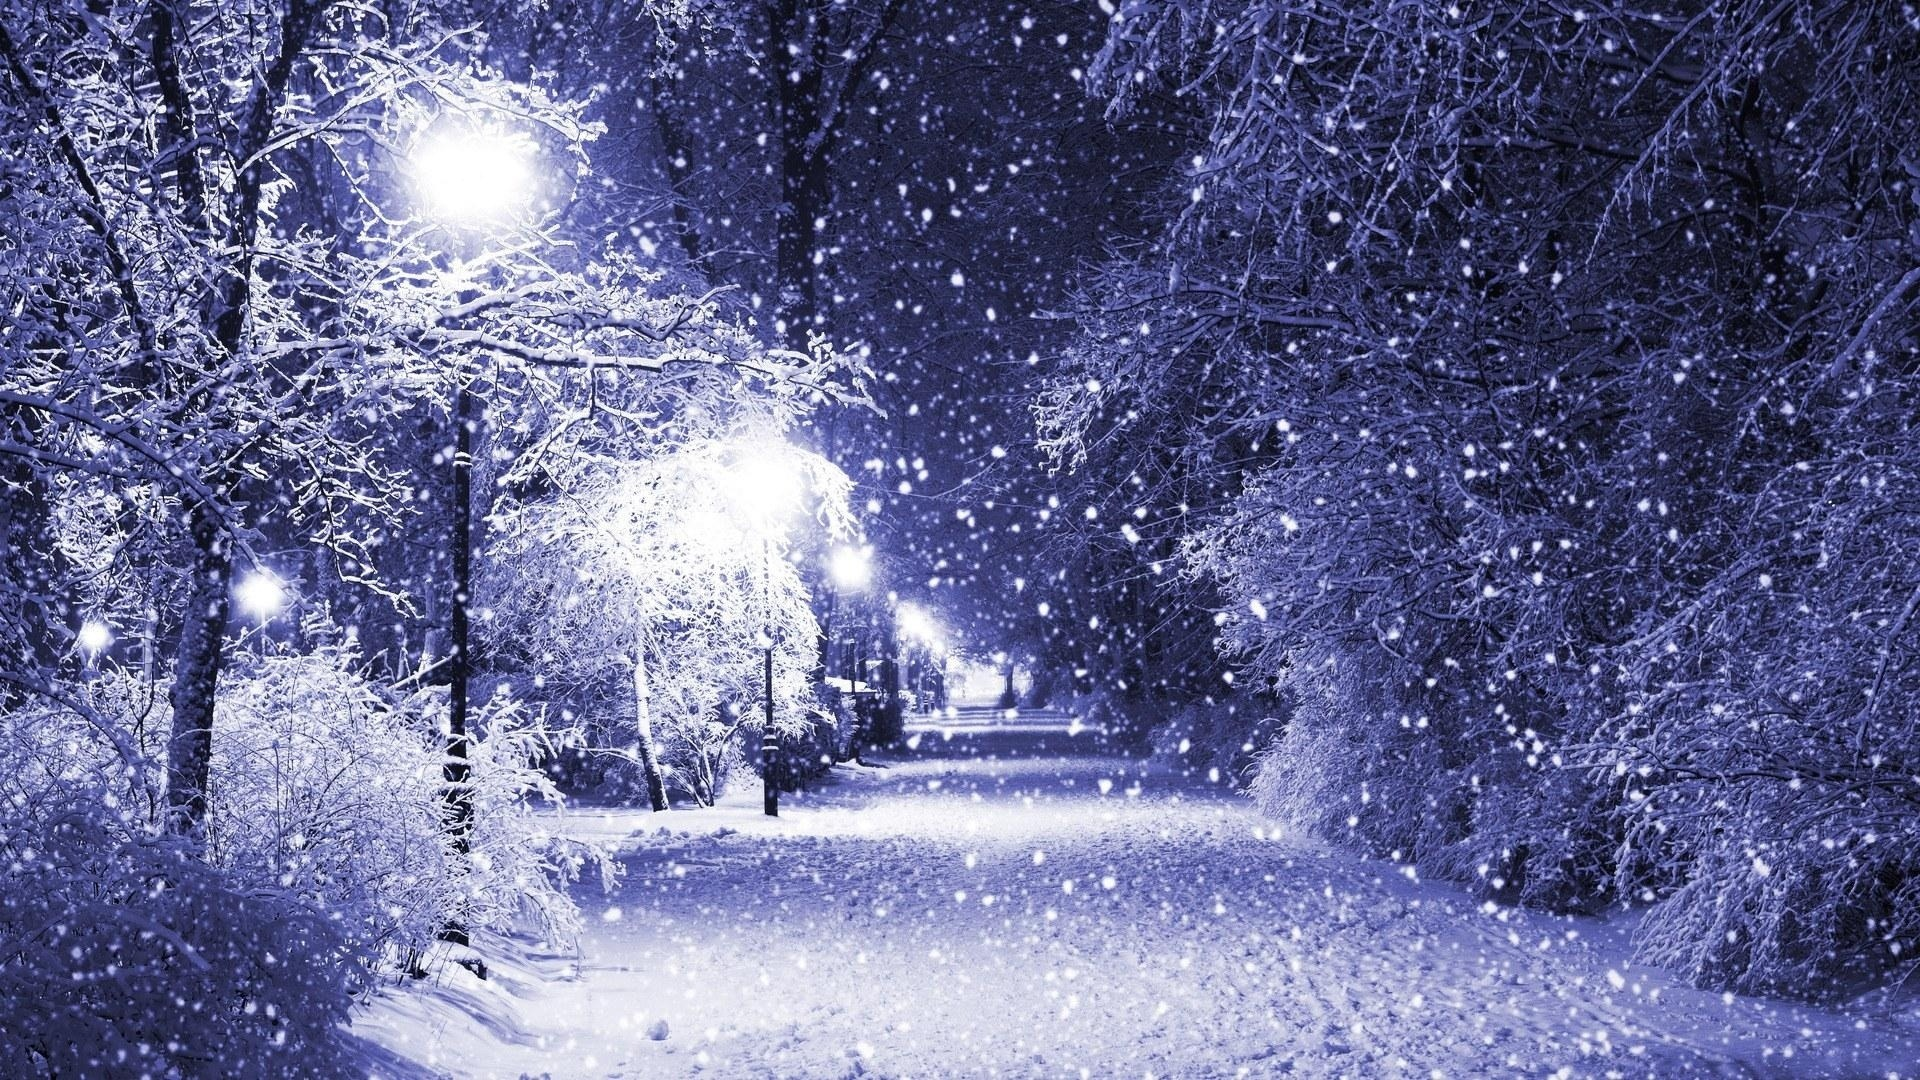 snow scene desktop wallpaper share this awesome desktop wallpaper 1920x1080